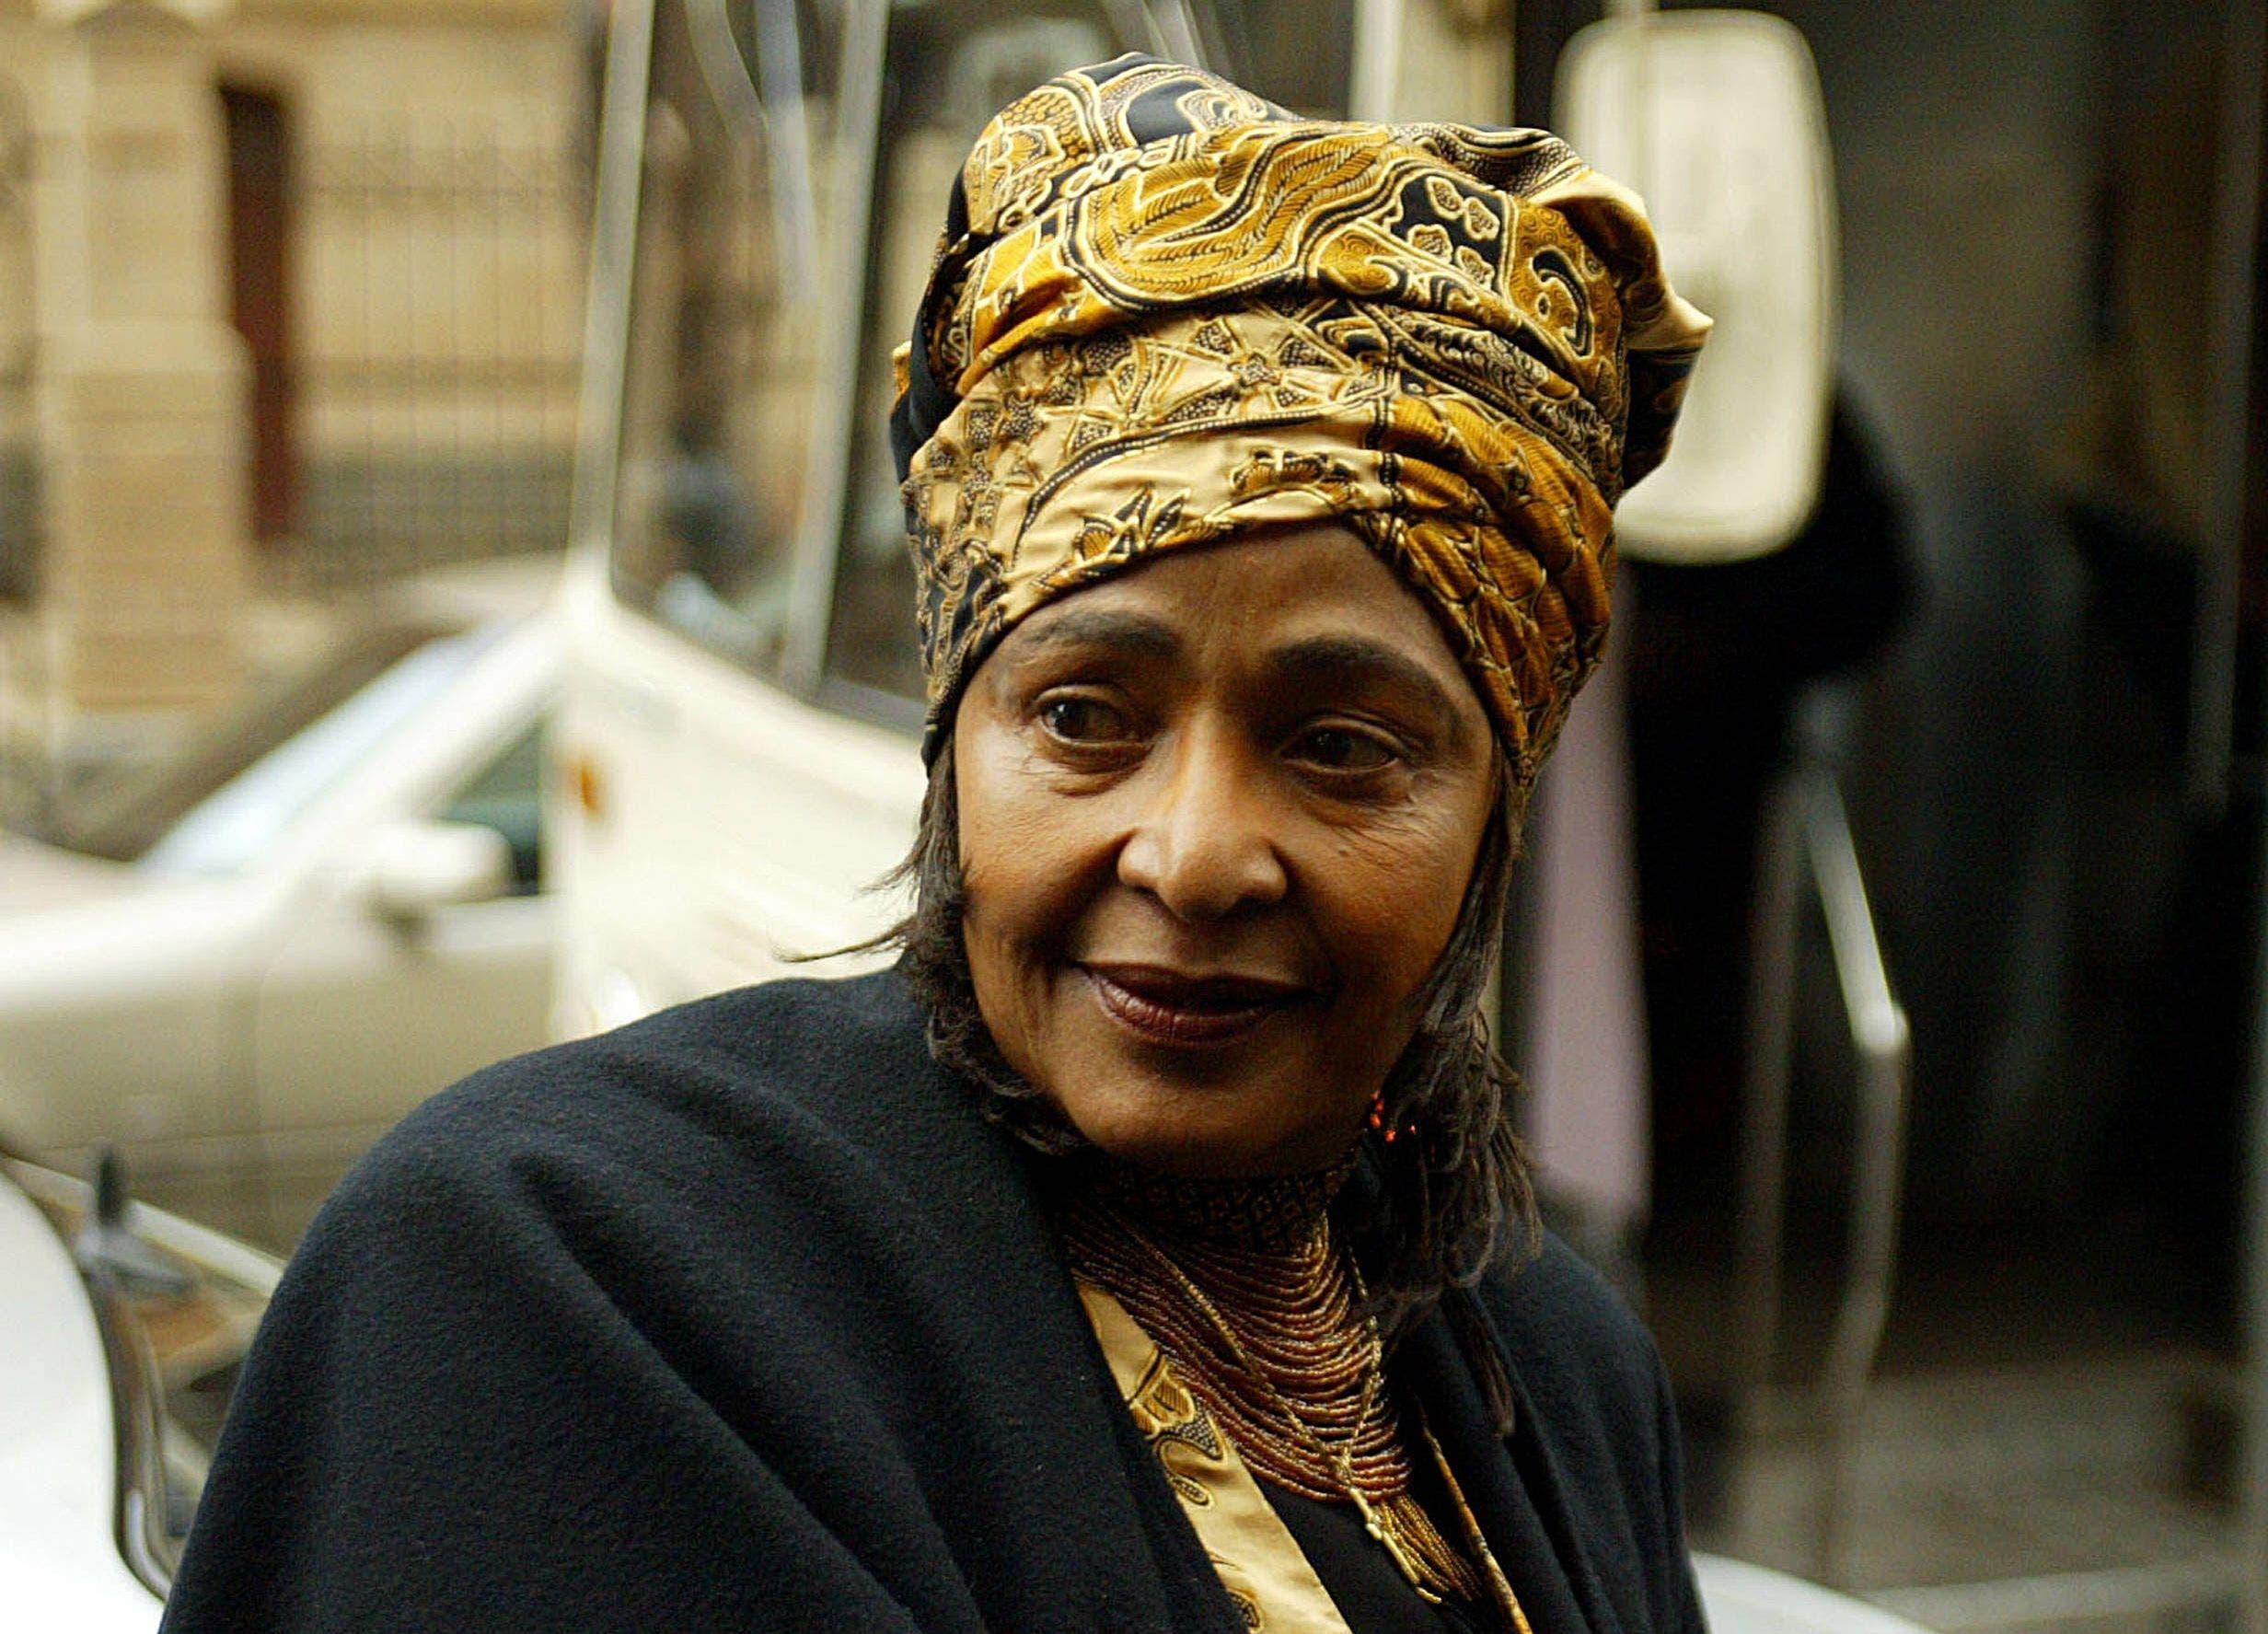 Muere Winnie Mandela, exesposa del expresidente sudafricano Nelson Mandela